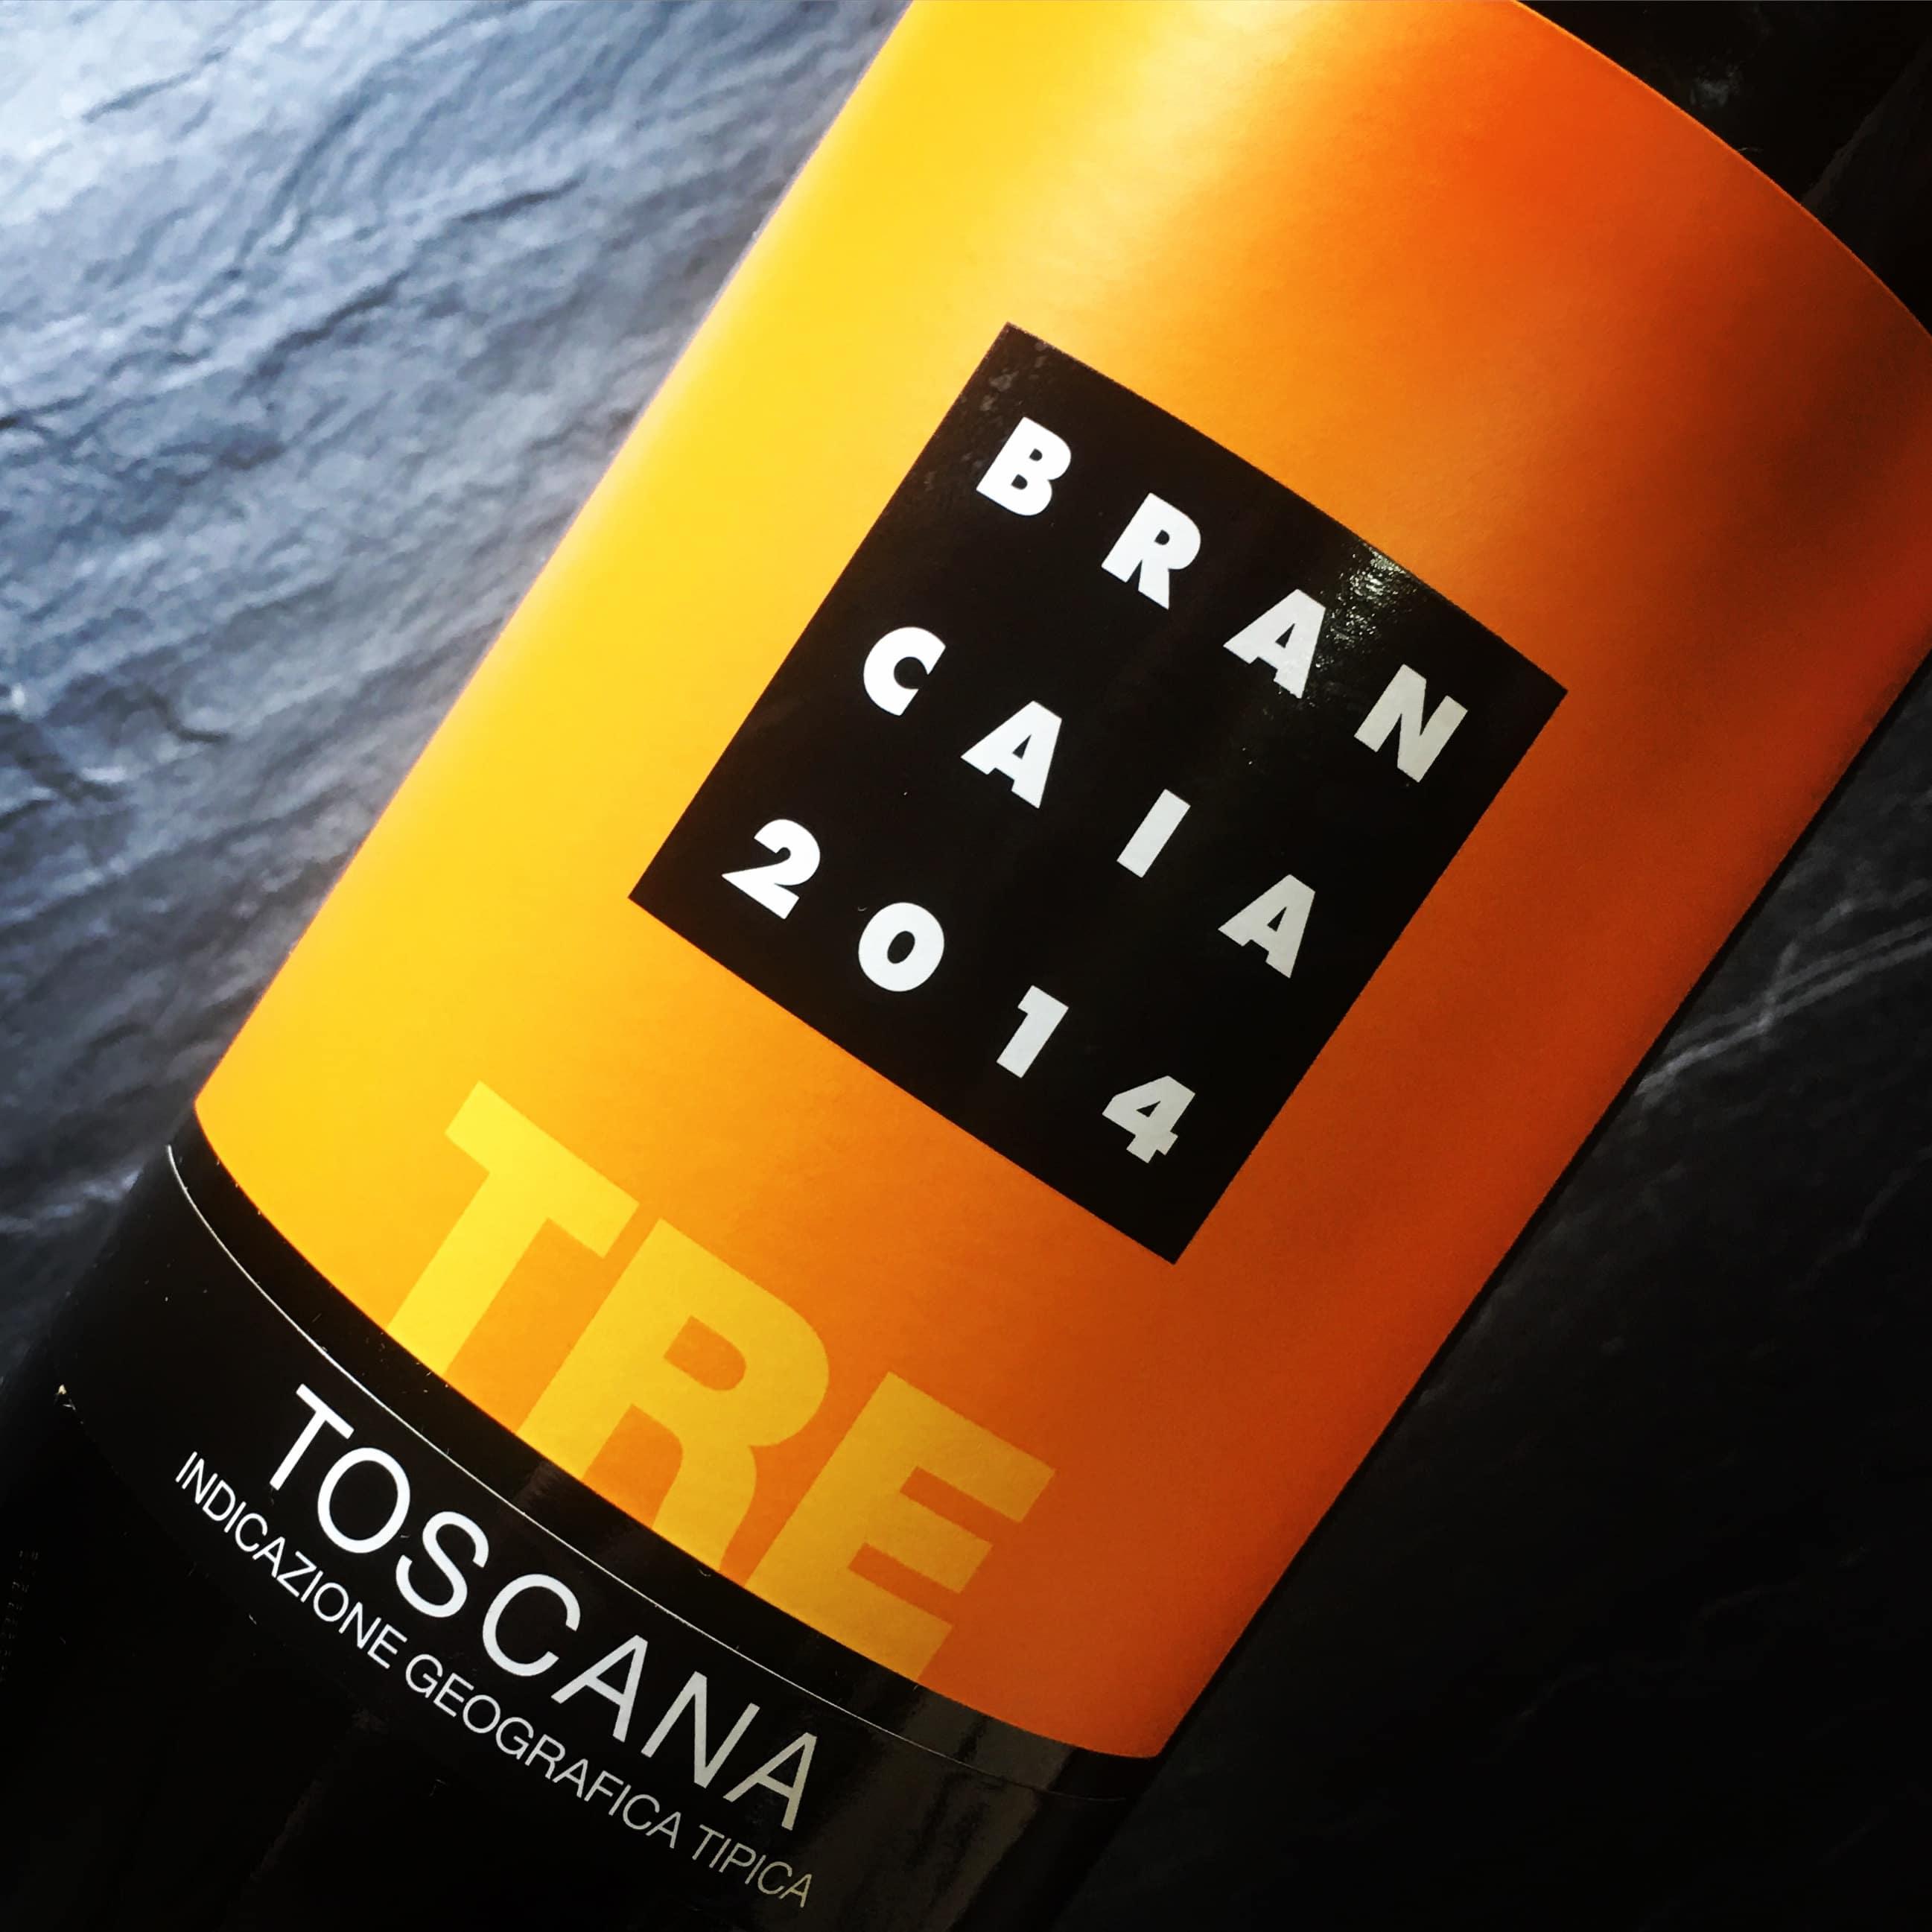 Brancaia Tre 2014